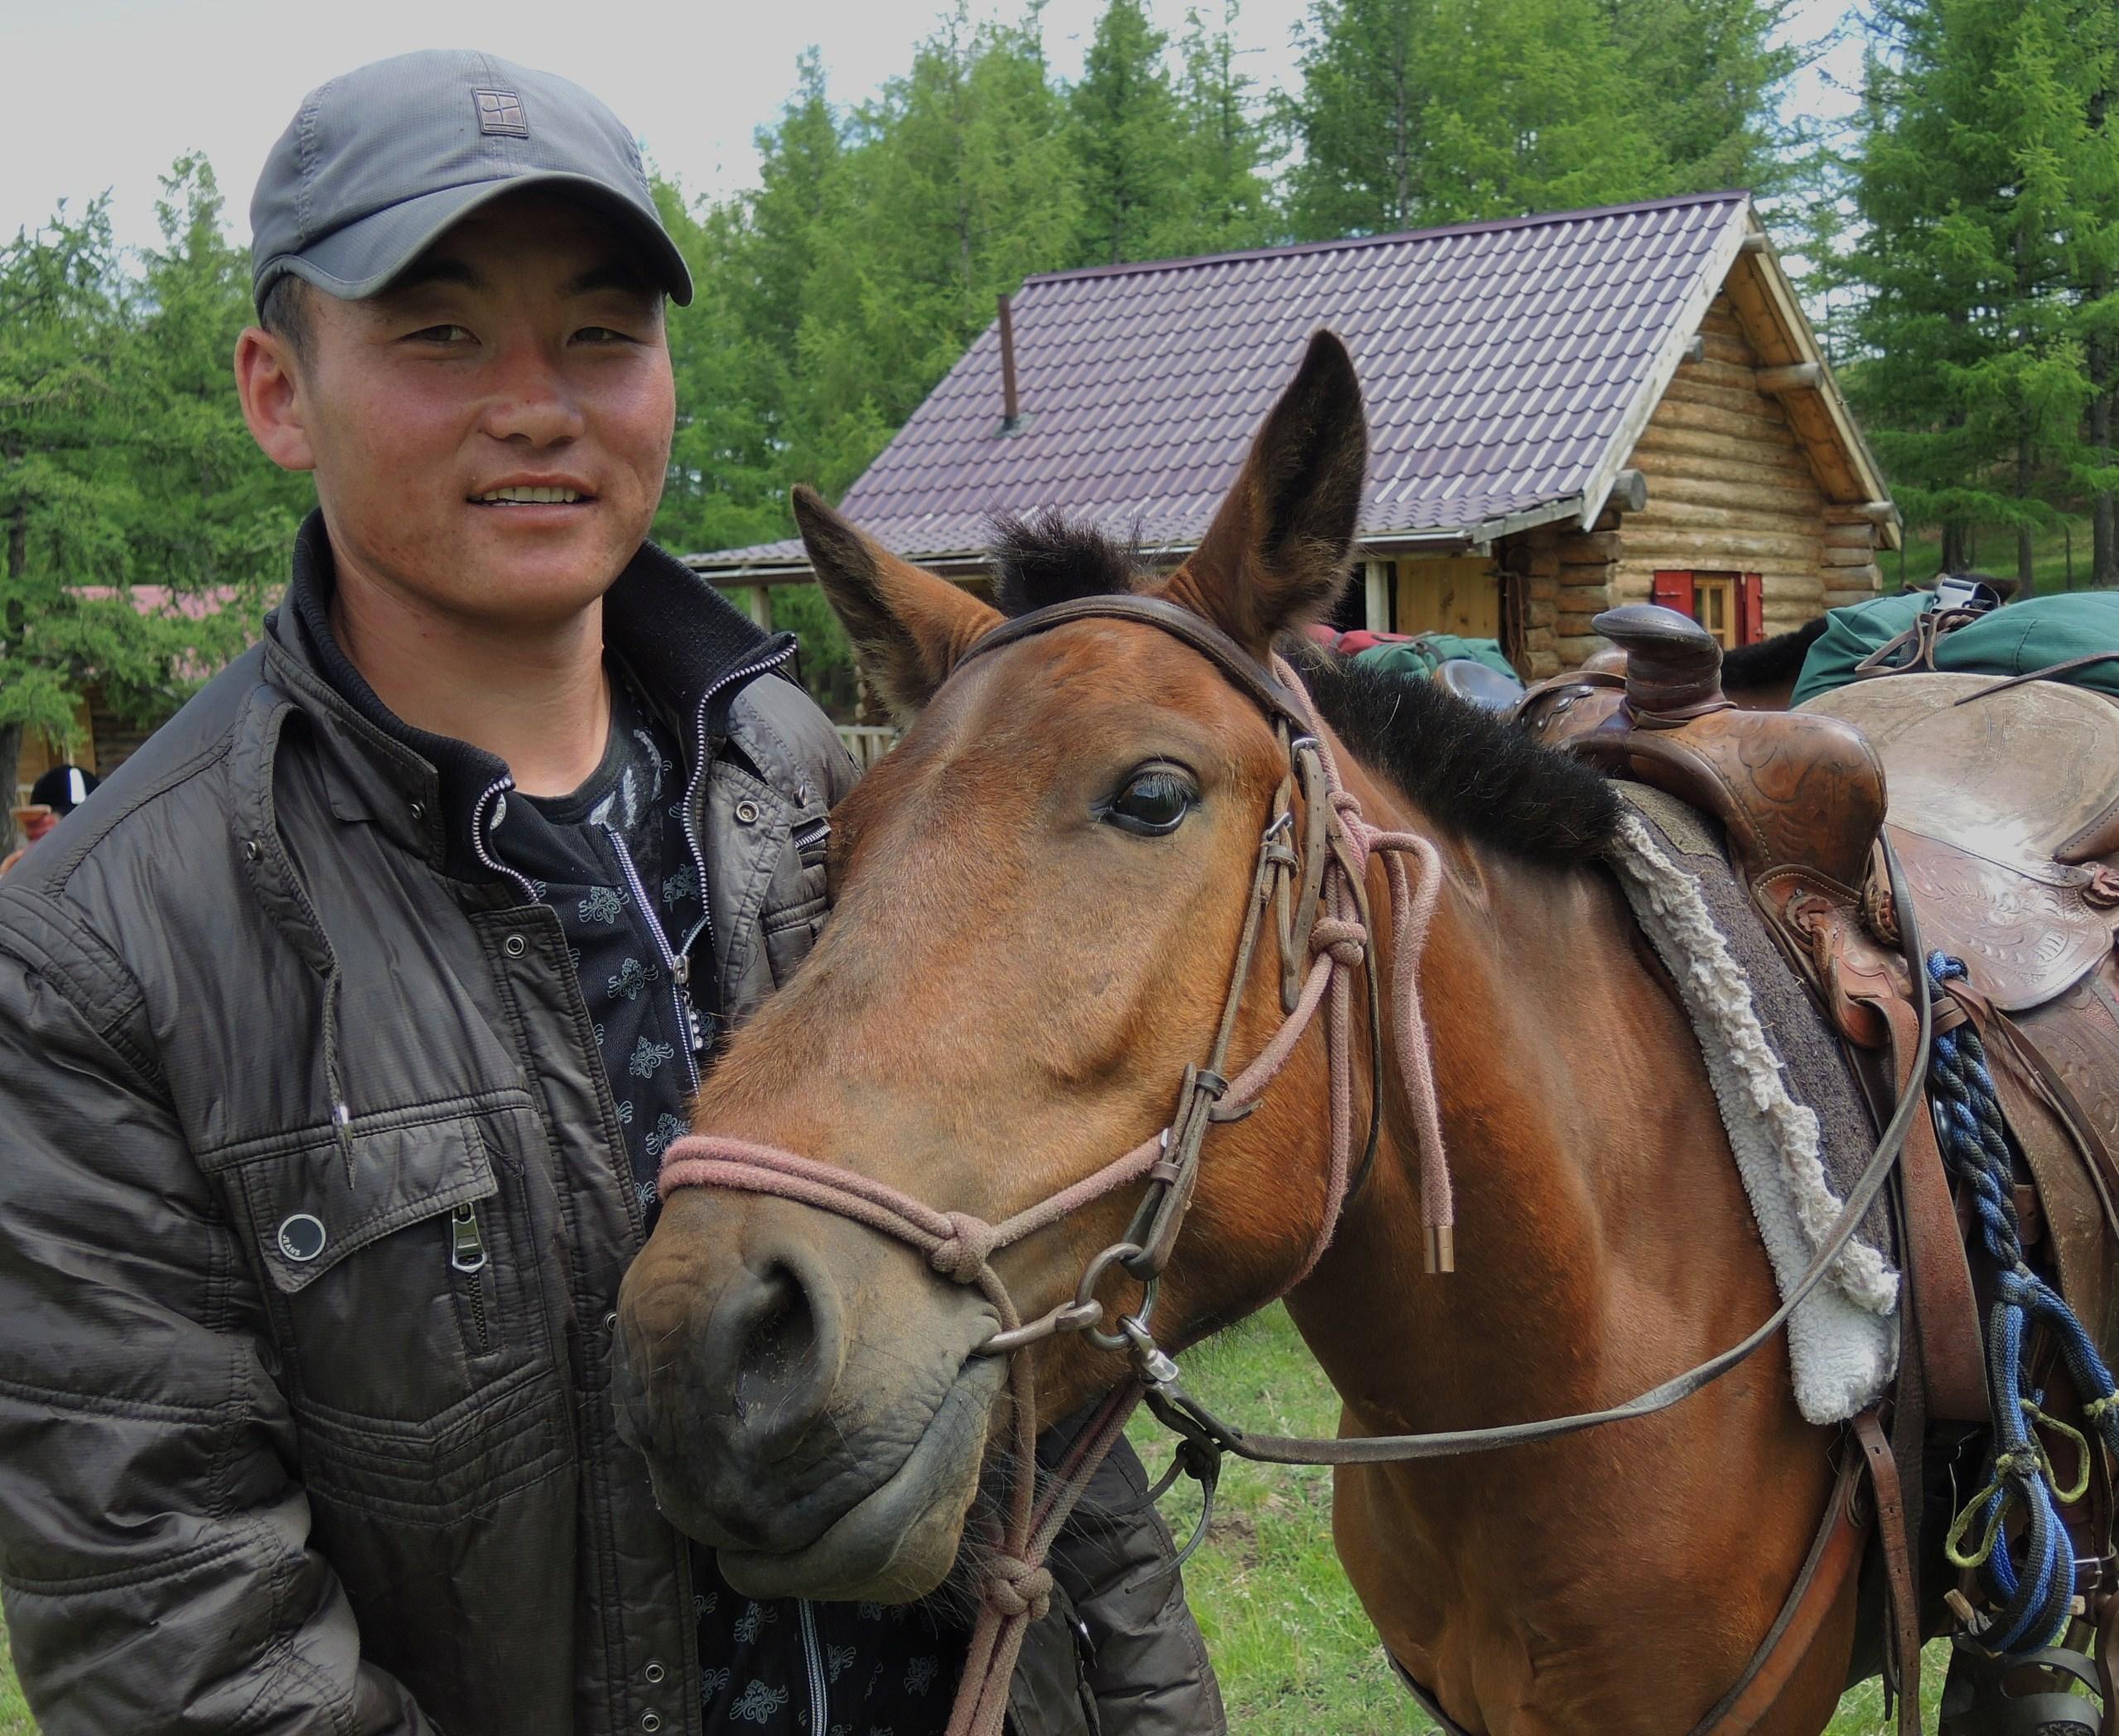 Mongolia horse riding, Mongolia horse trekking, horse riding in Mongoia, horse trekking in Mongolia, horse travel in Mongolia, Mongolia national parks,